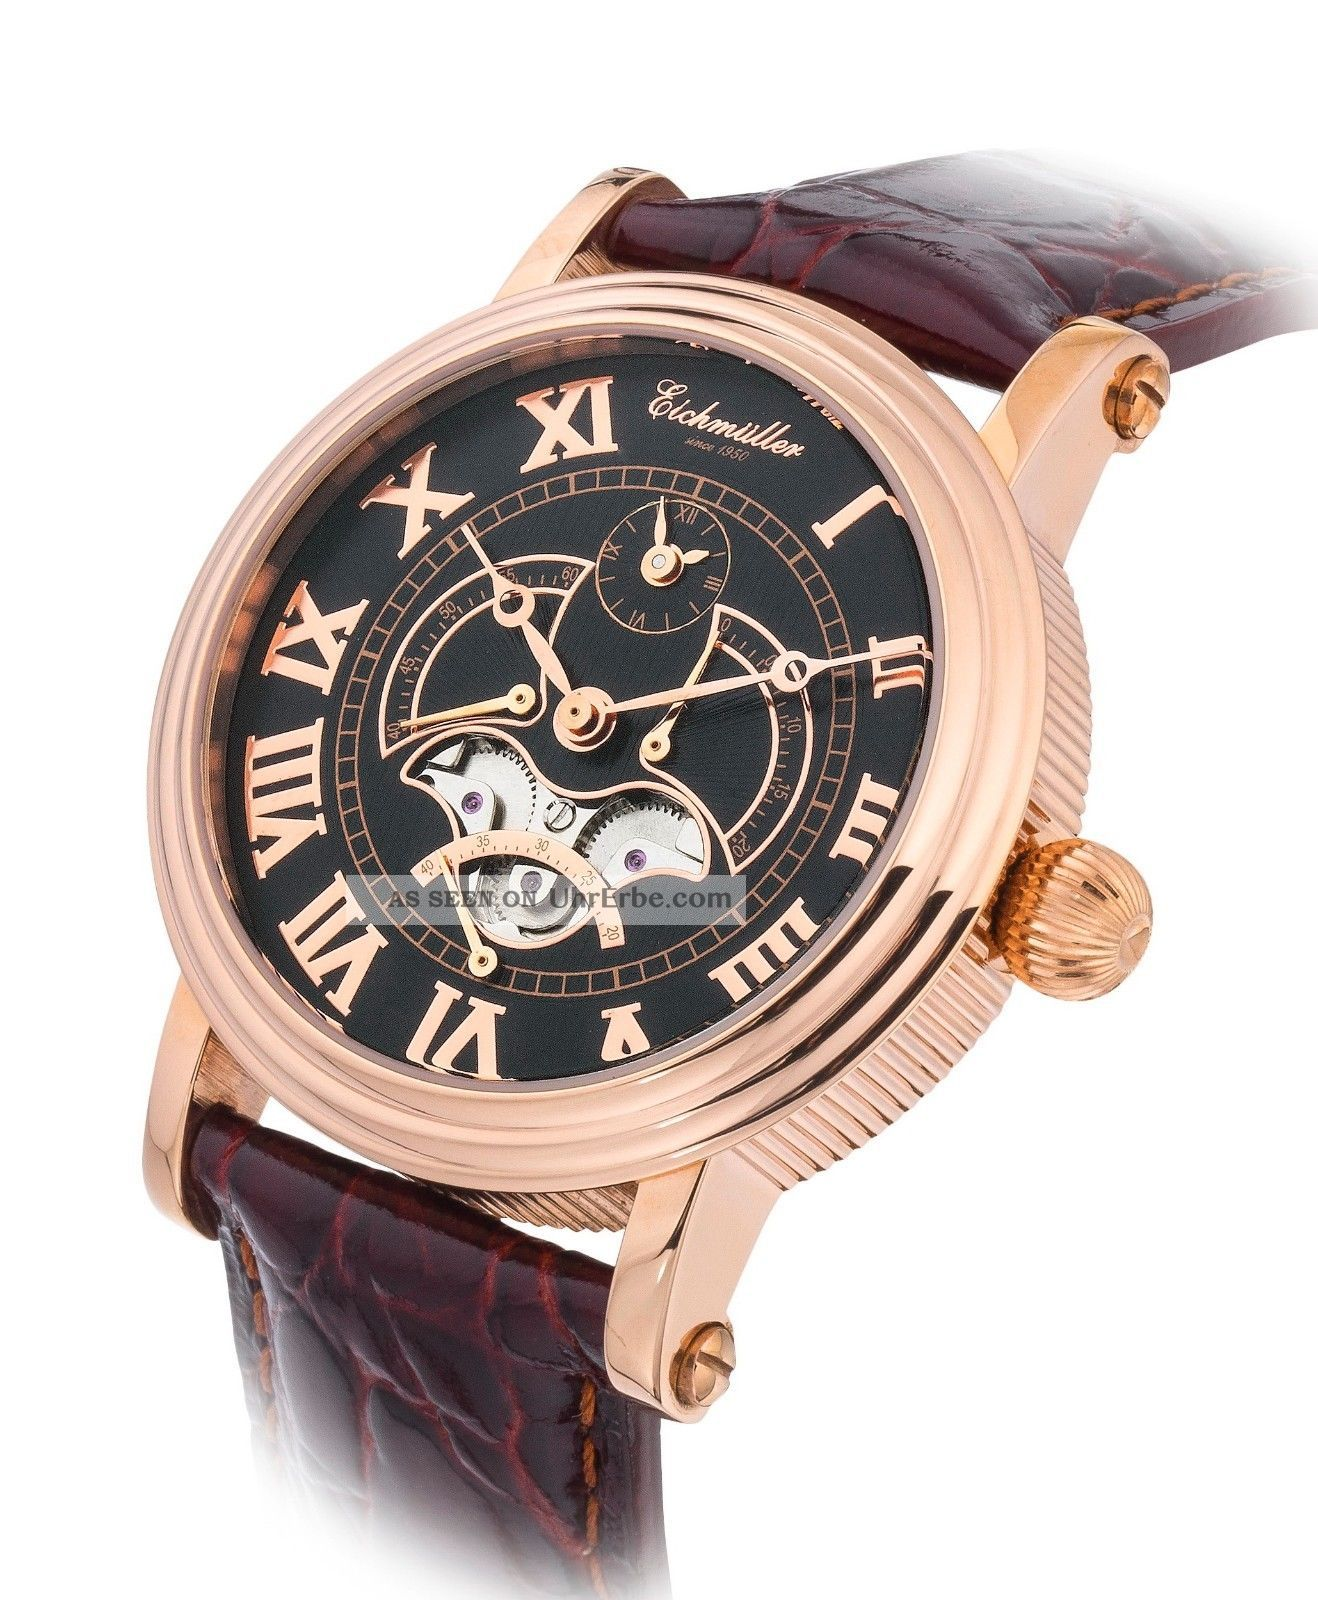 Stilvolle EichmÜller Automatik Uhr Herrenuhr Dualtime Edelstahl Uhr Rose,  Box Armbanduhren Bild